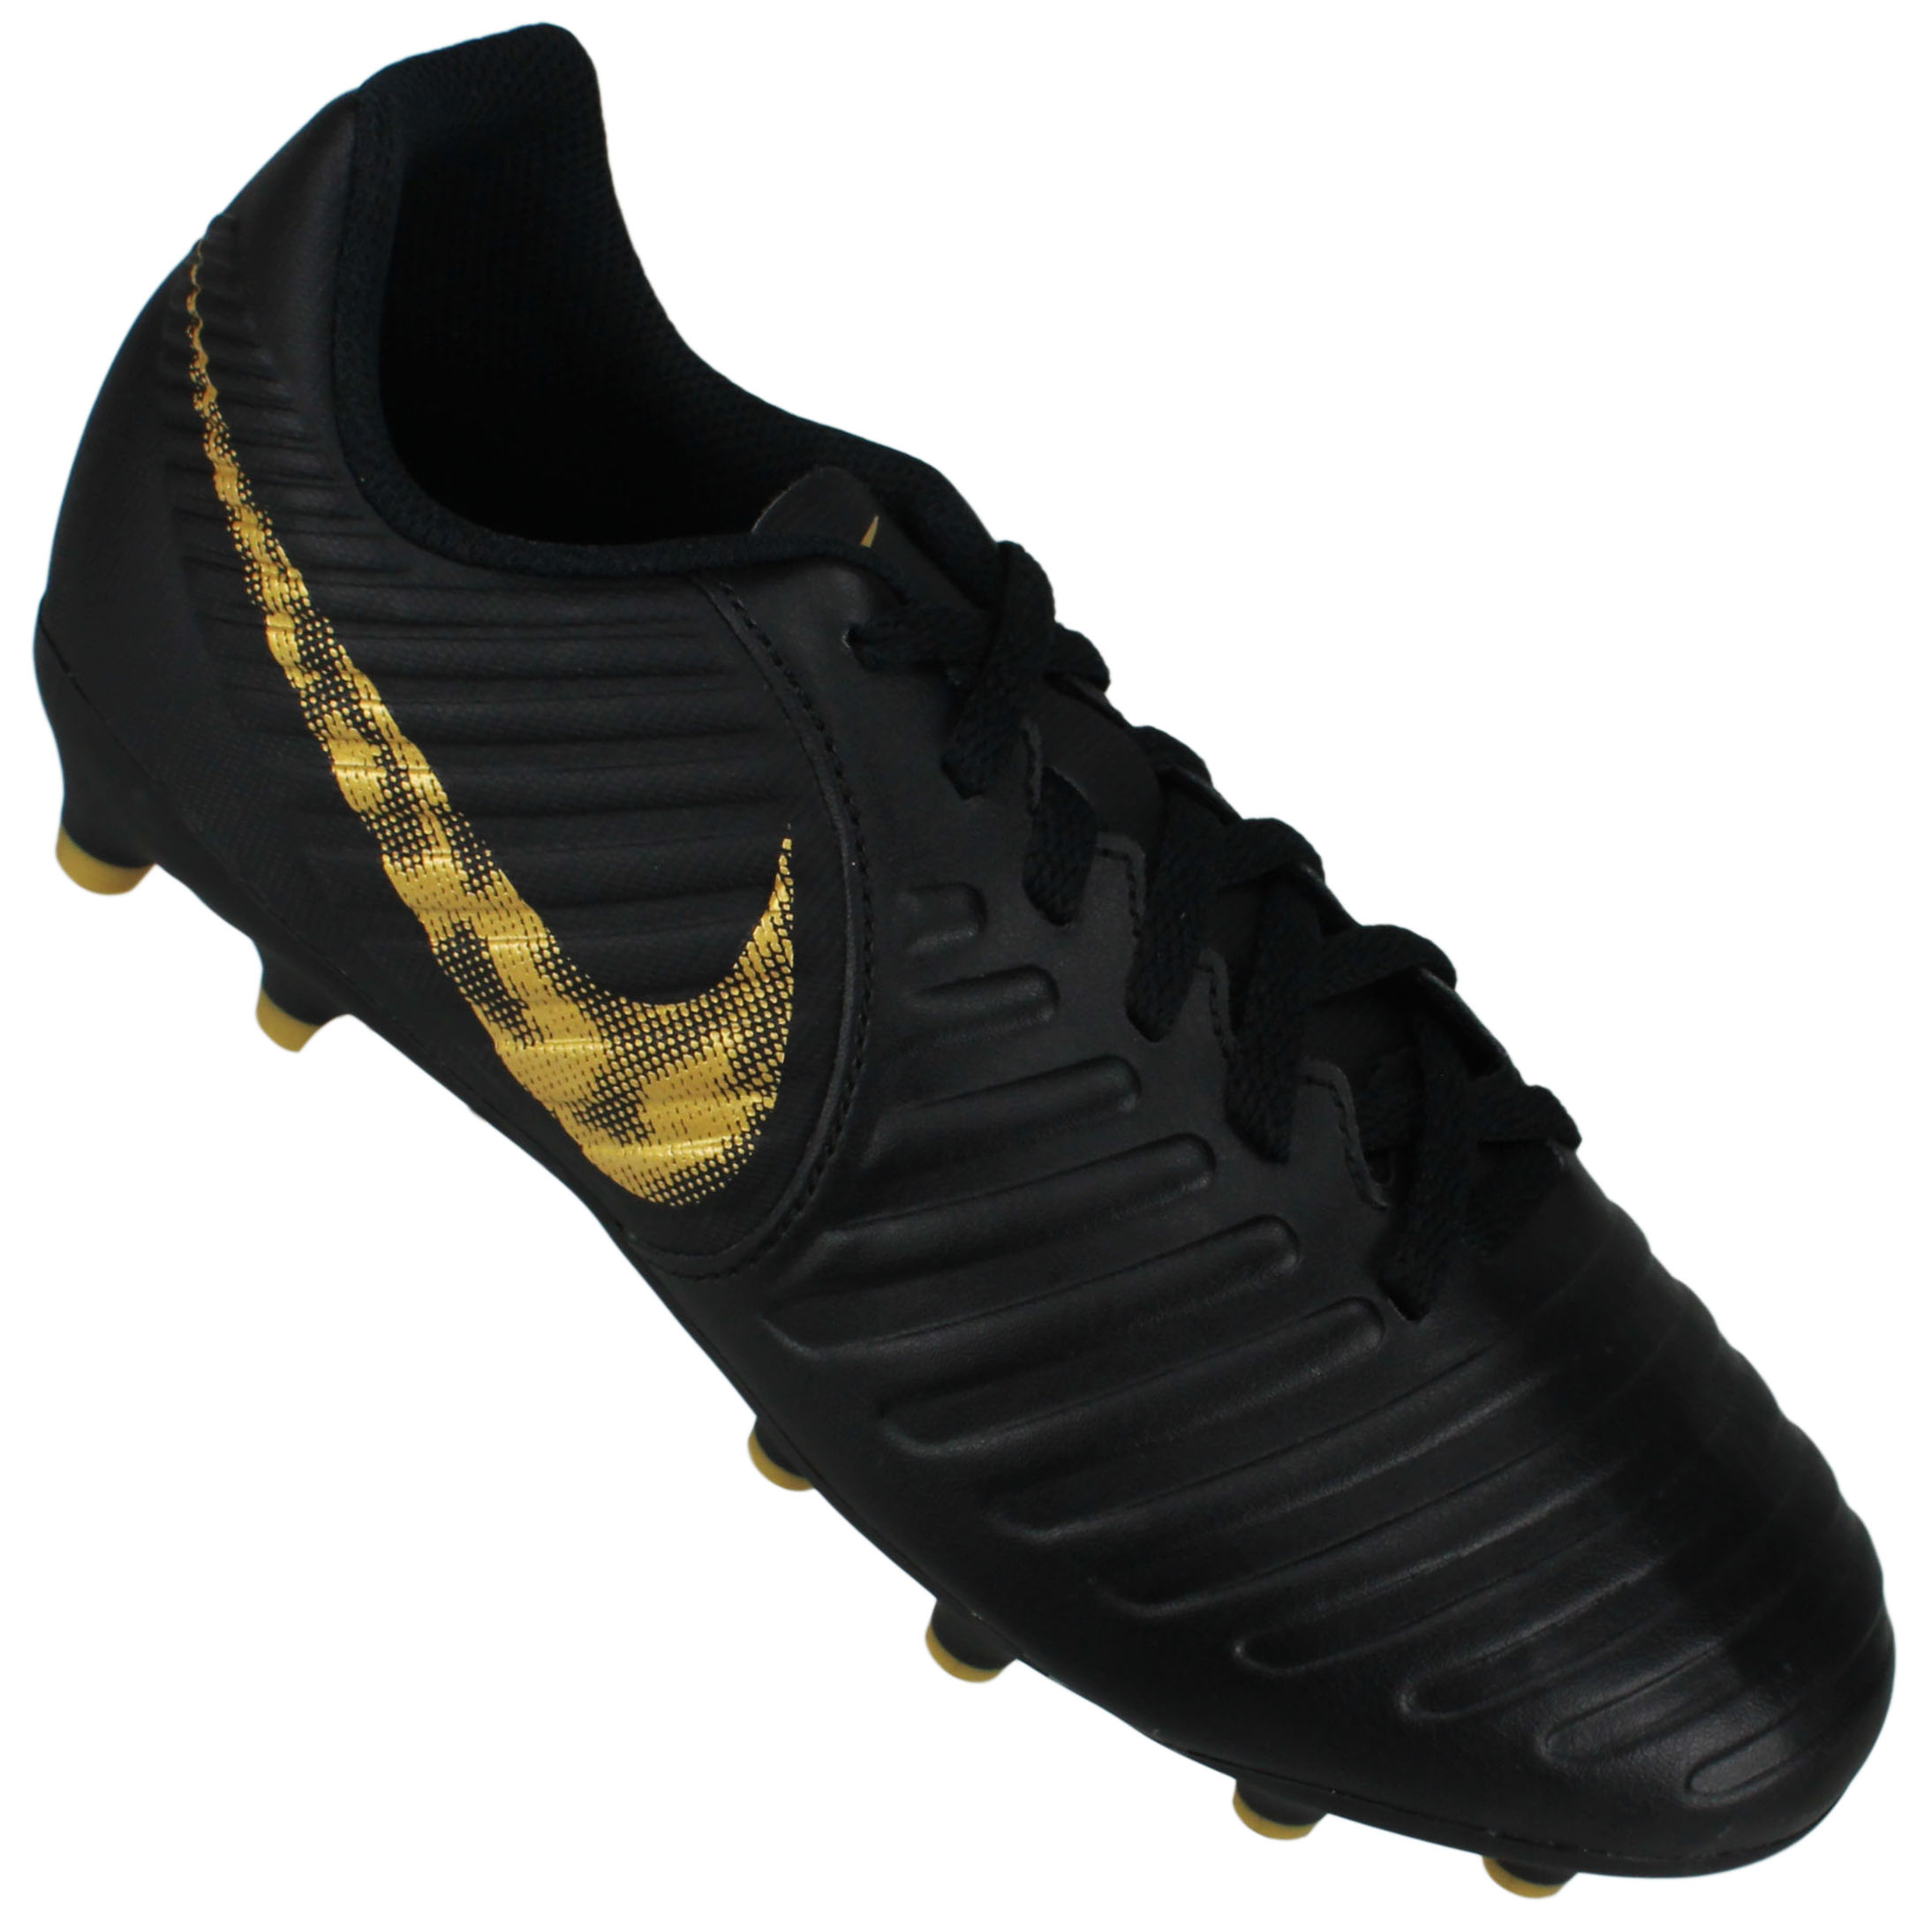 f19d3805b Imagem - Chuteira Campo Nike Legend 7 Club Juvenil